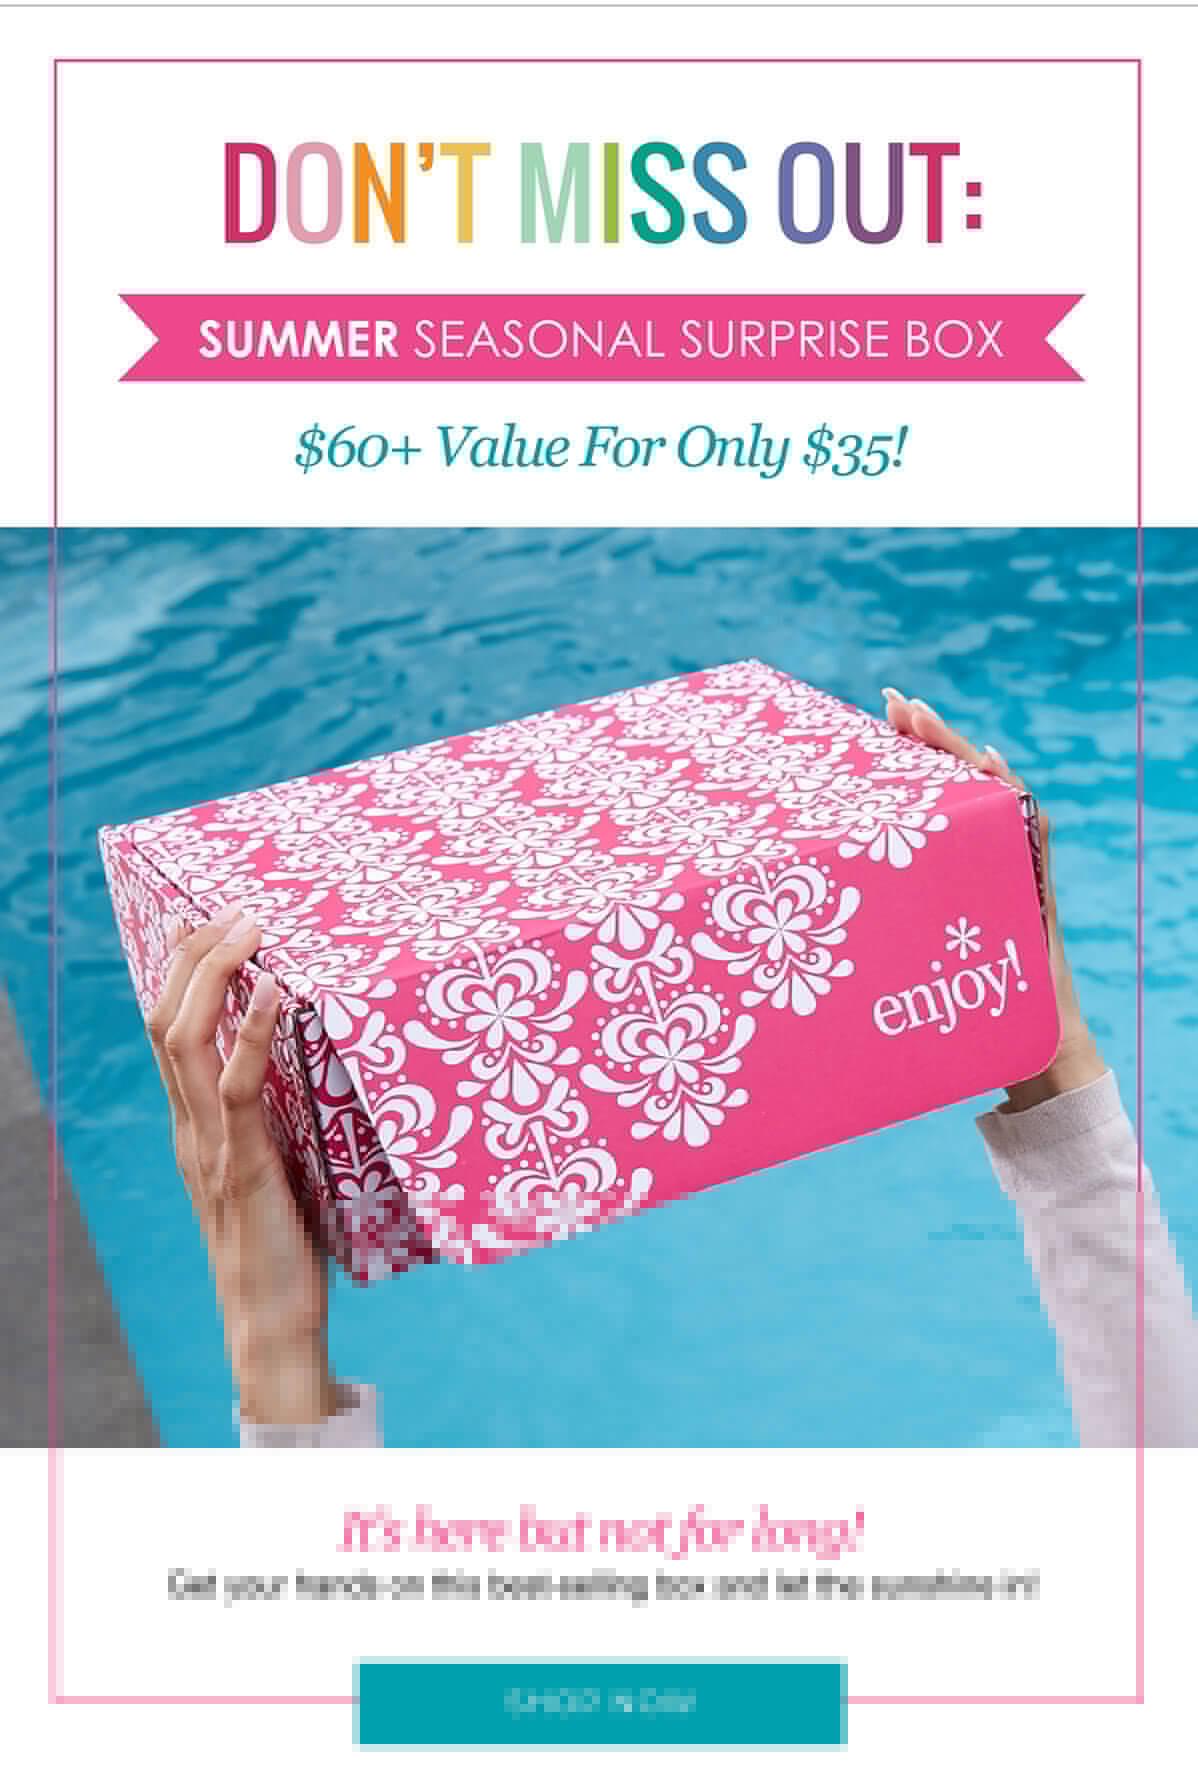 Erin Condren Summer 2018 Seasonal Surprise Box Sneak Peek + Last Call